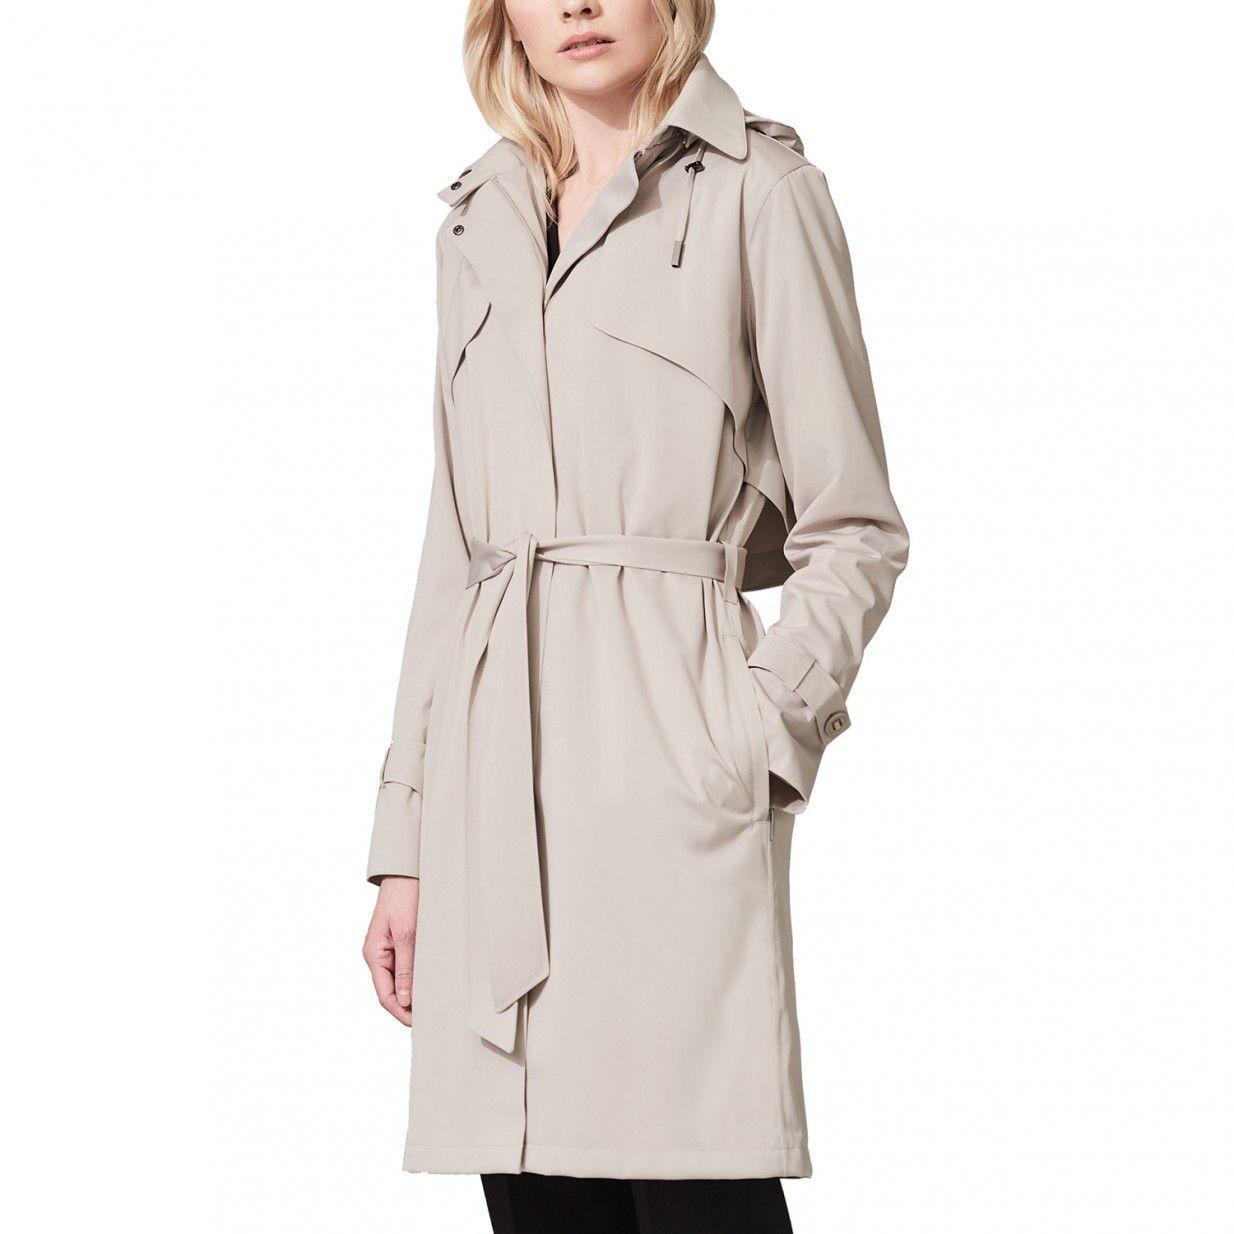 Großhandelsverkauf Großbritannien Straßenpreis Trenchcoat - Creme | Protected Species Figurbetont, feminin ...